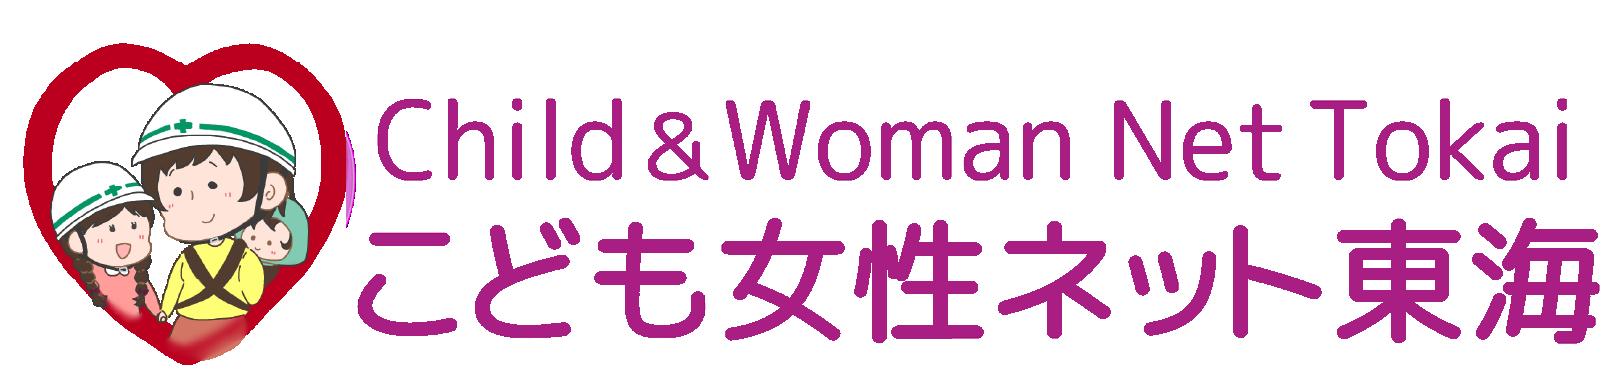 Child&Woman_Net_Tokai